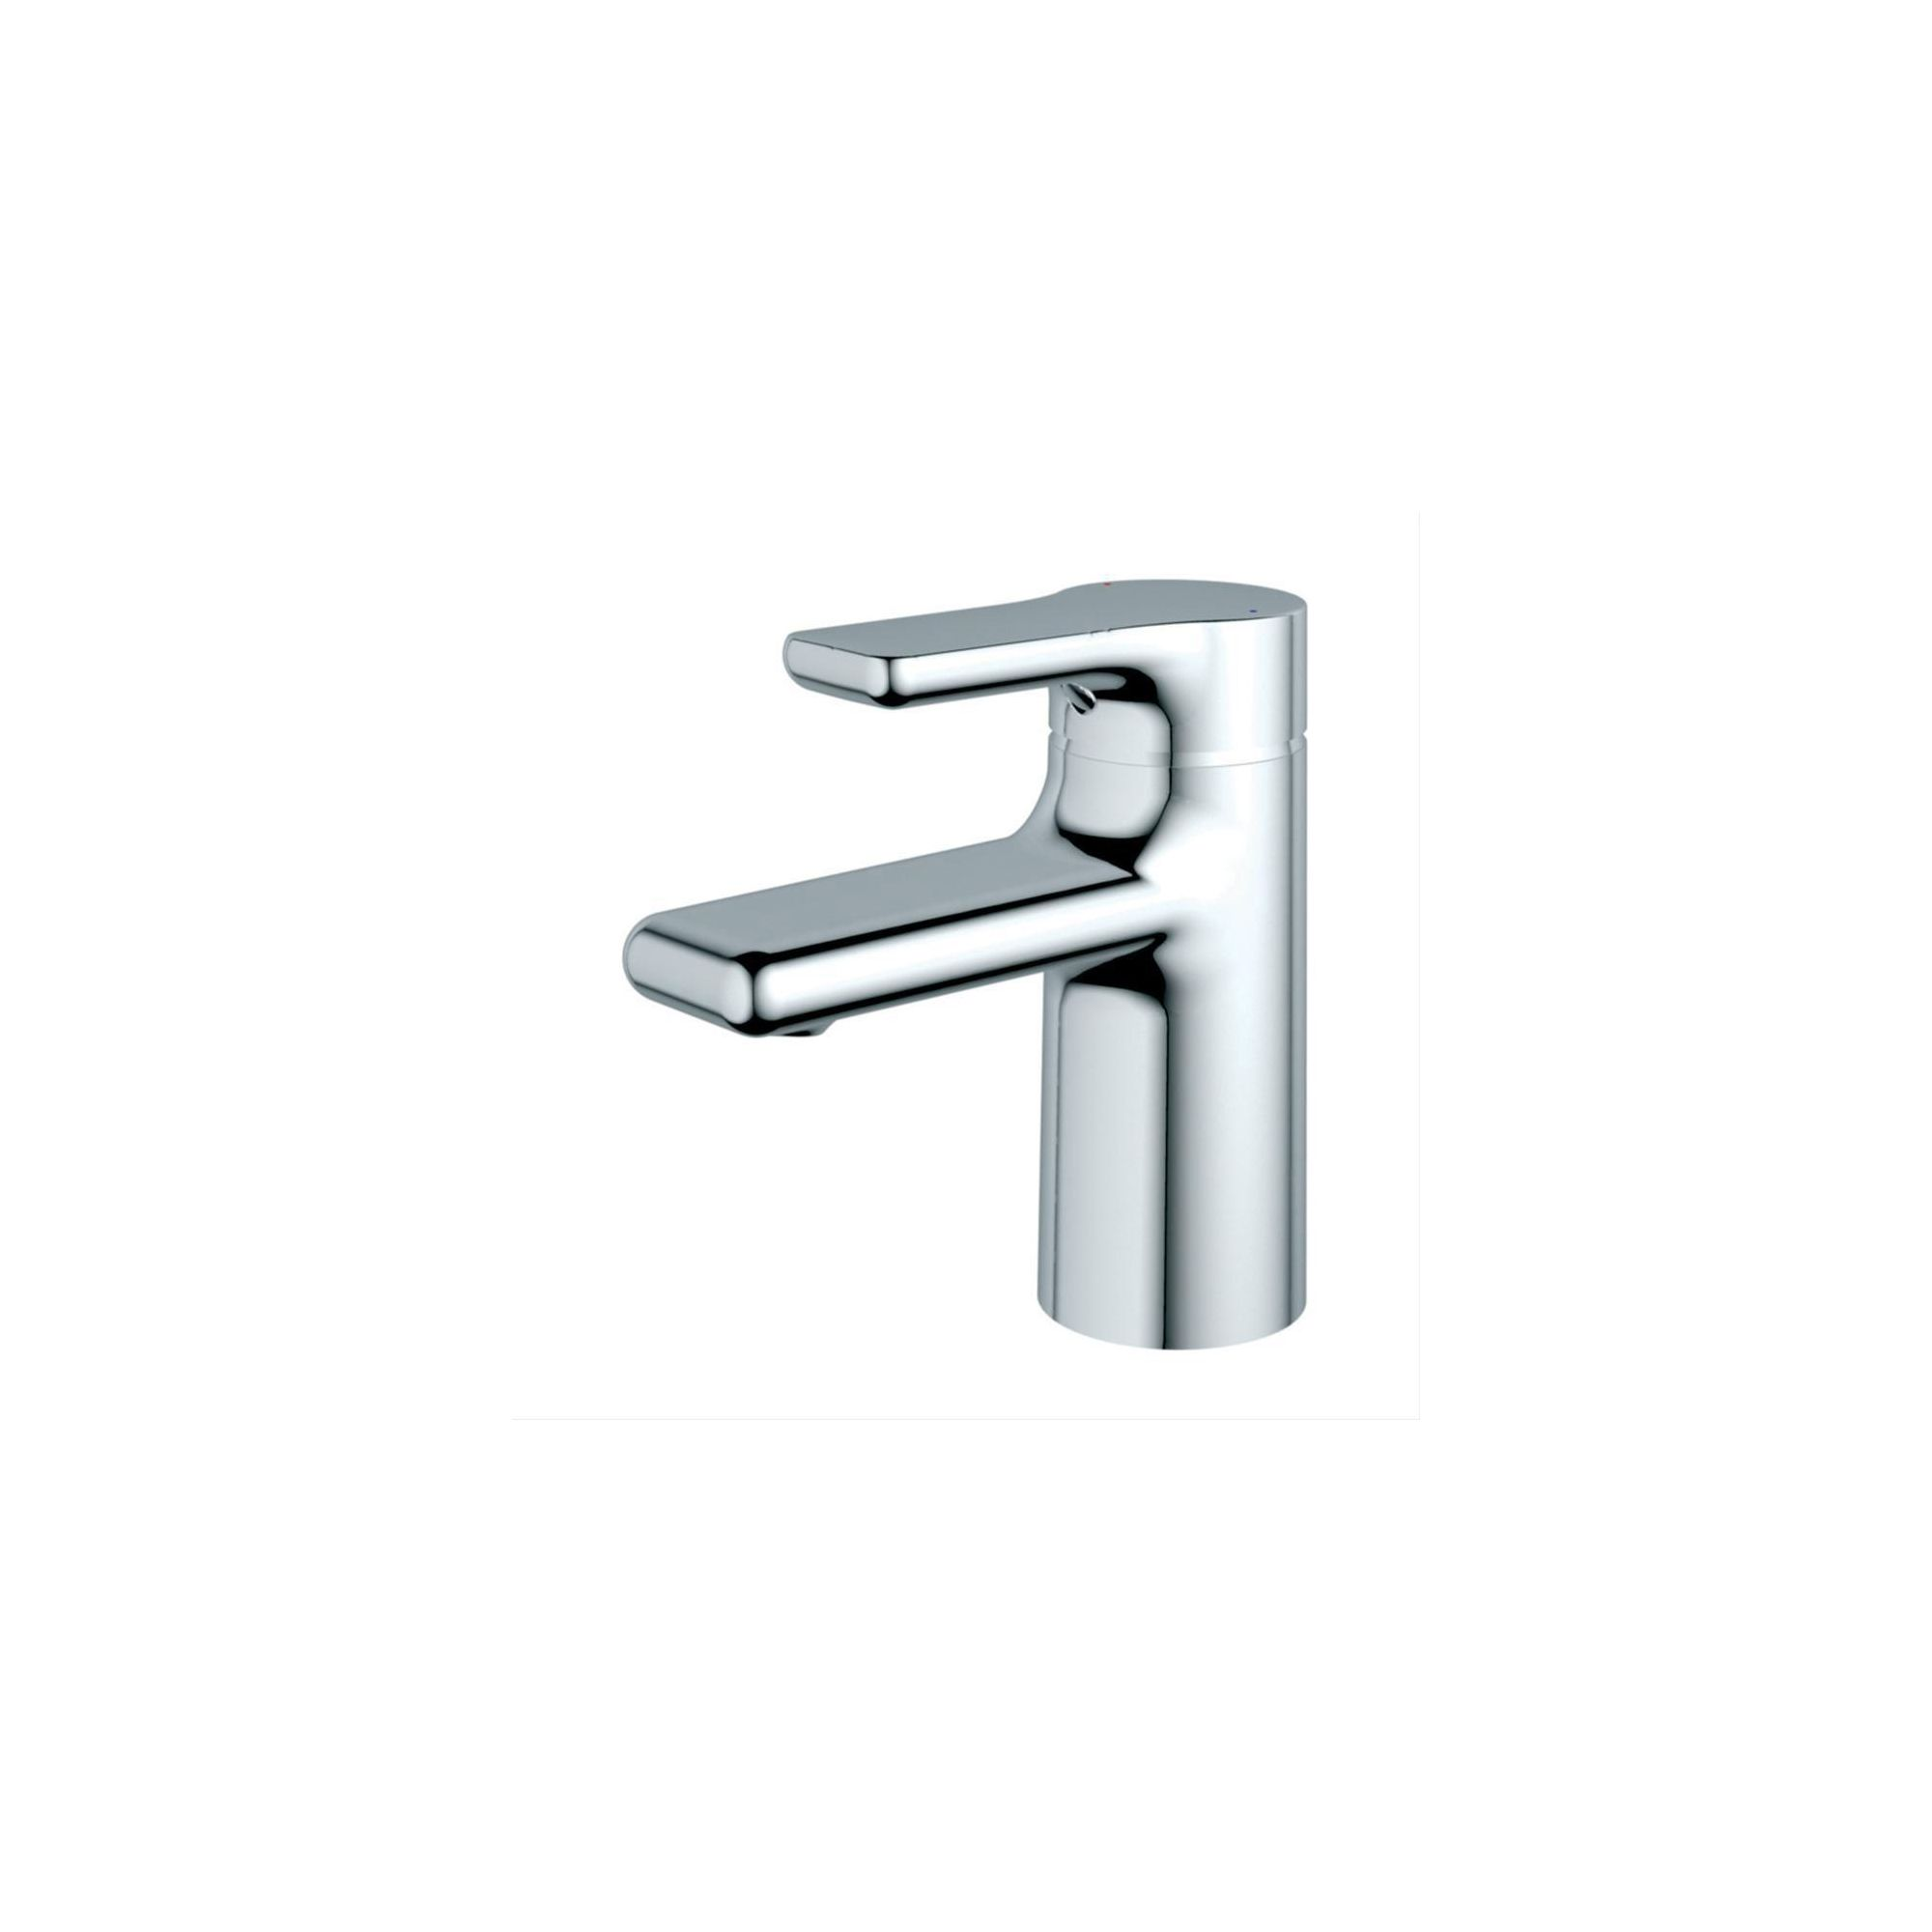 Ideal Standard Attitude Mono Bath Filler Tap Chrome at Tescos Direct